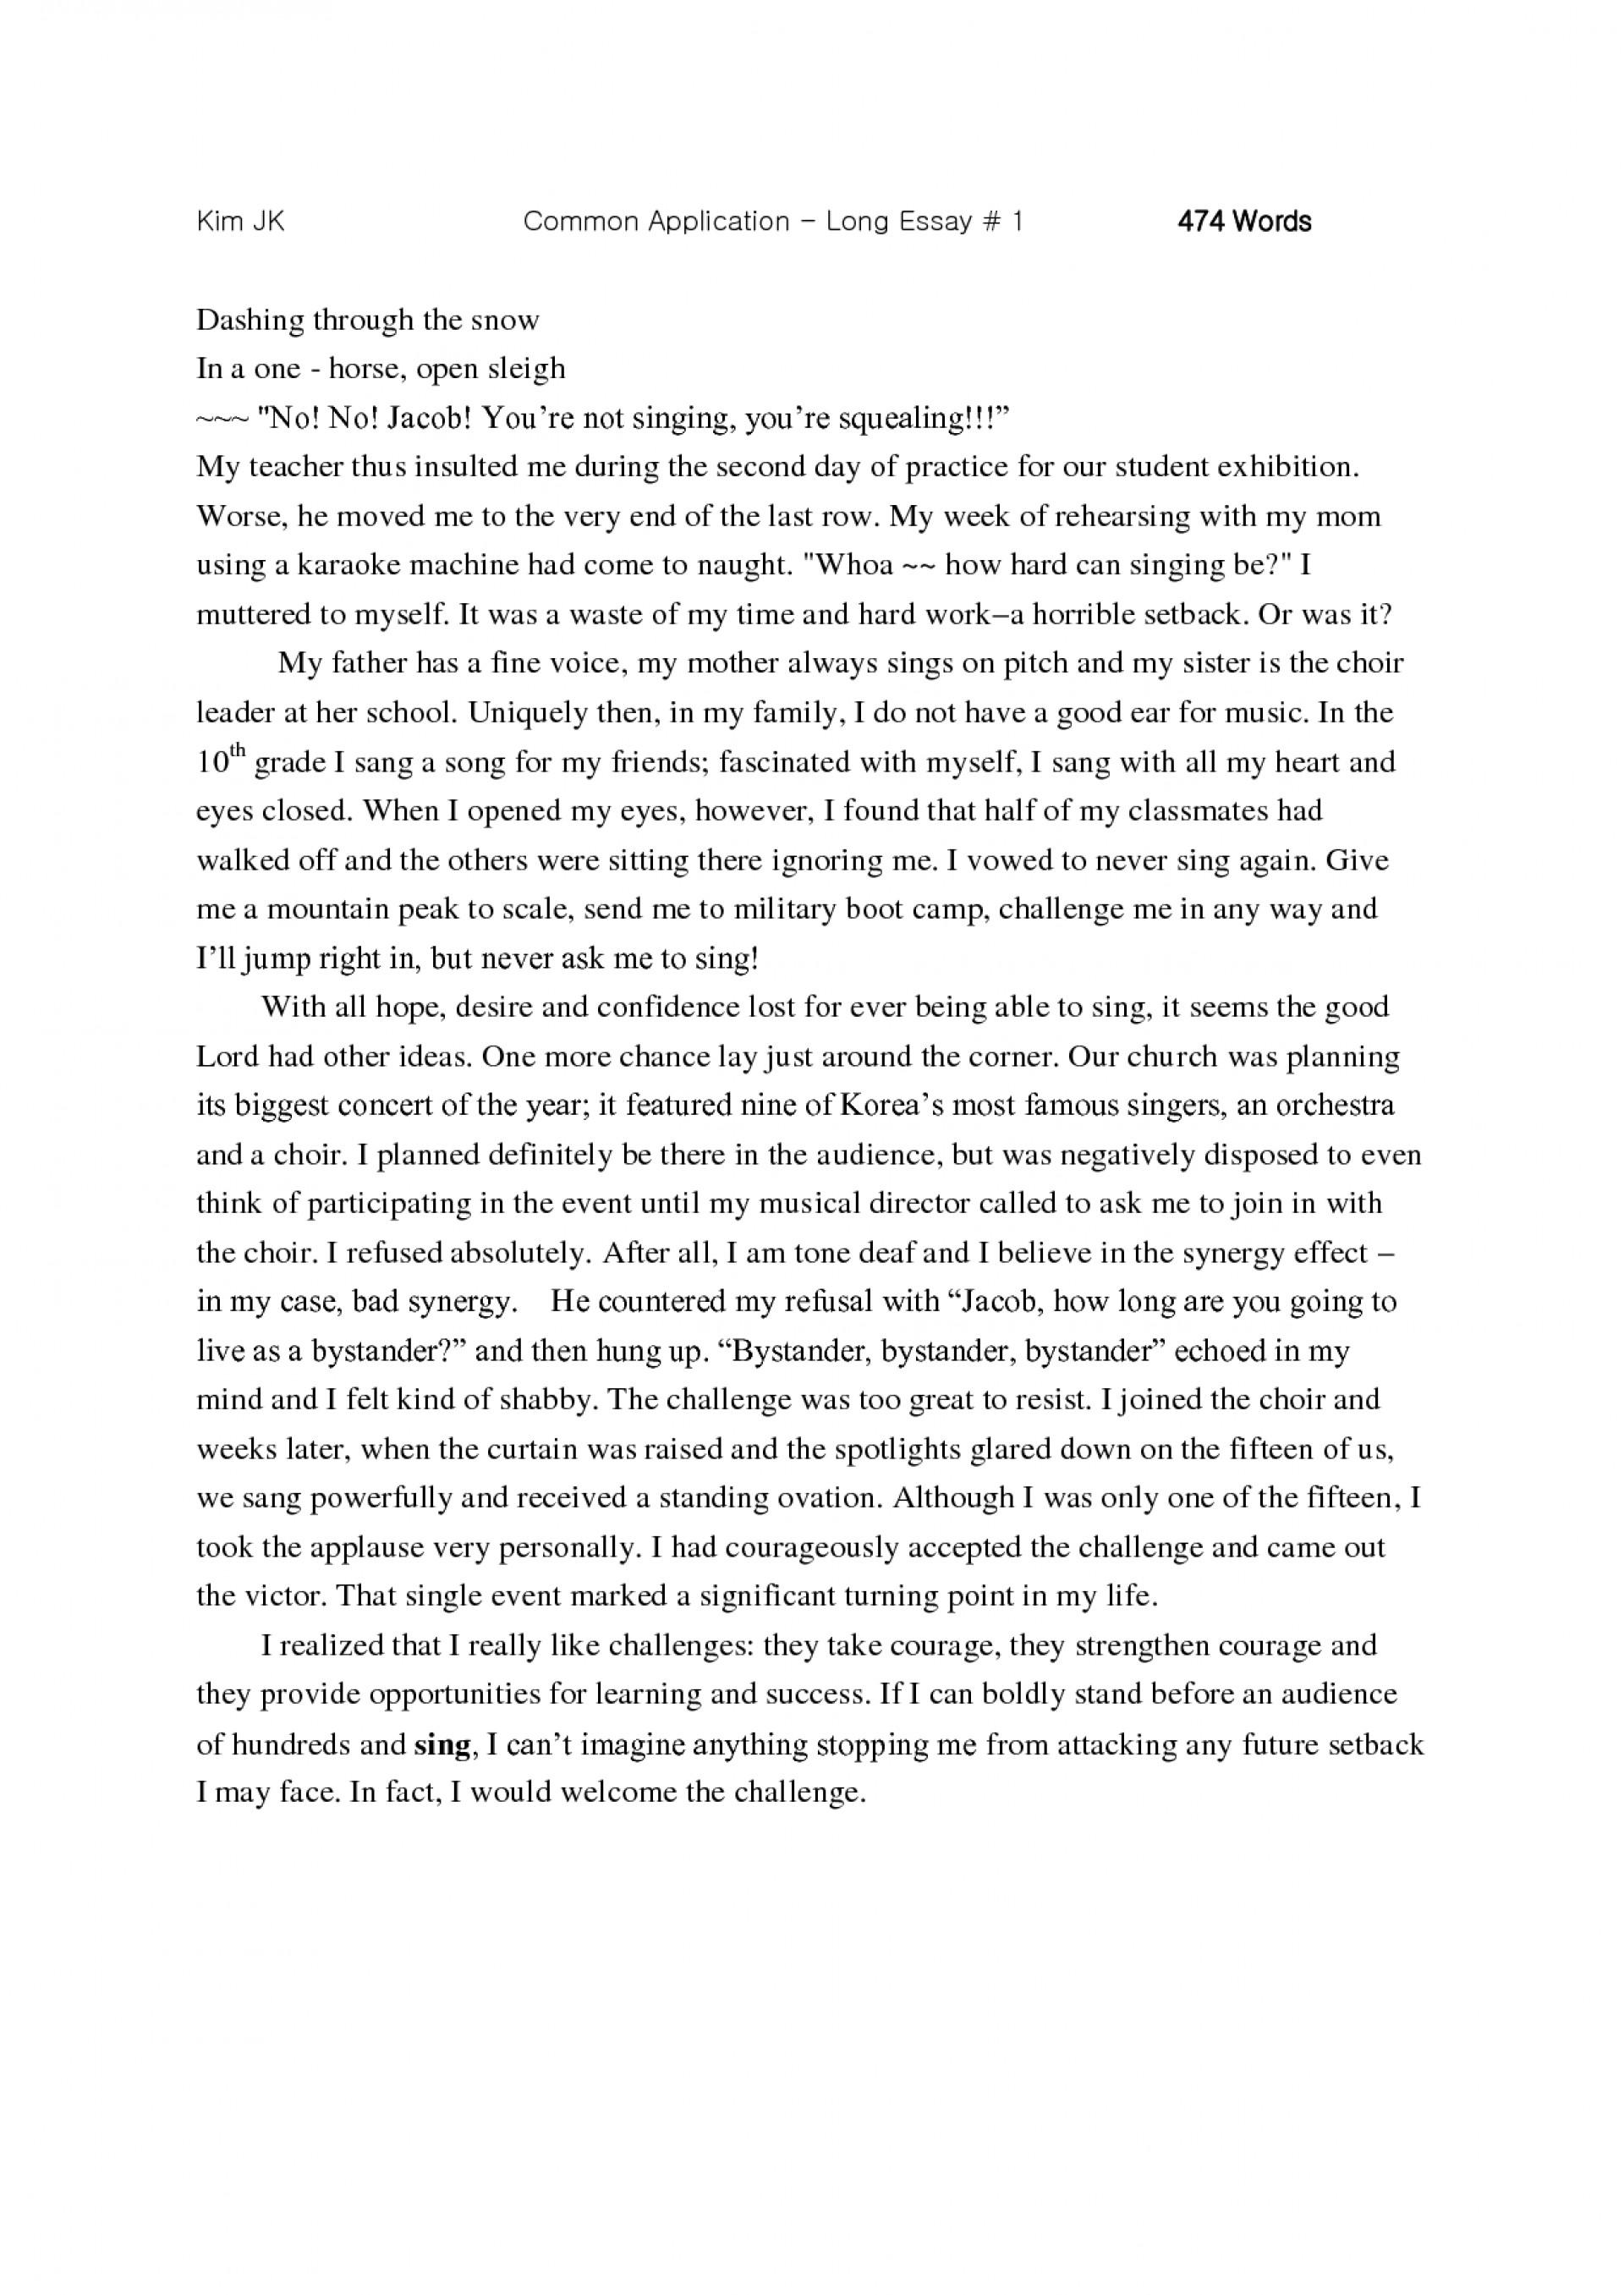 001 Brilliant Ideas Of College Application Essayples Format Targer Golden Dragon Fantastic Good Common App Essays Best Magnificent 2018 Ivy League New York Times 1920